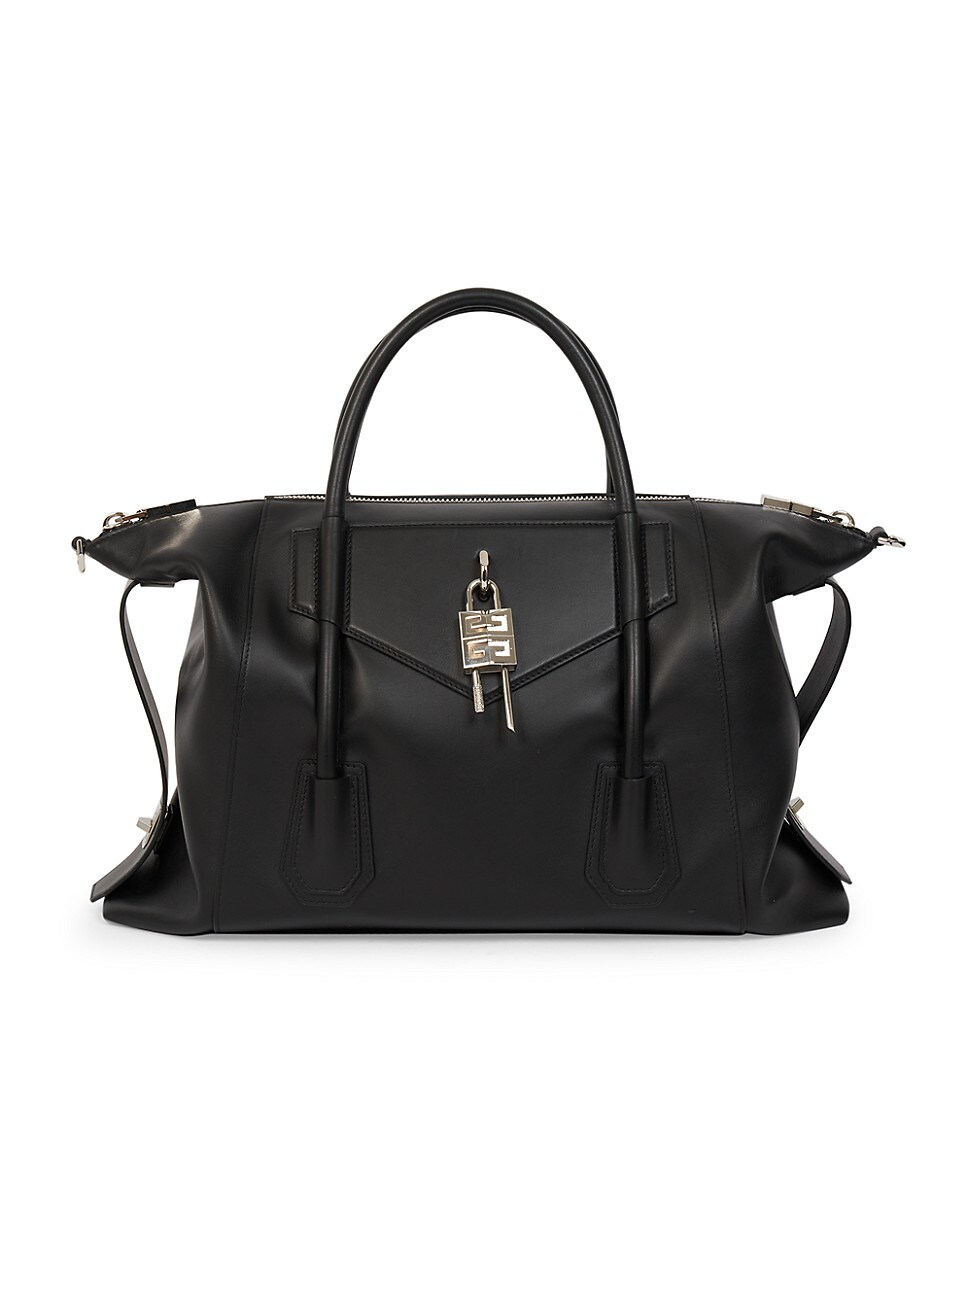 Givenchy Leathers WOMEN'S MEDIUM ANTIGONA LOCK SOFT LEATHER SATCHEL